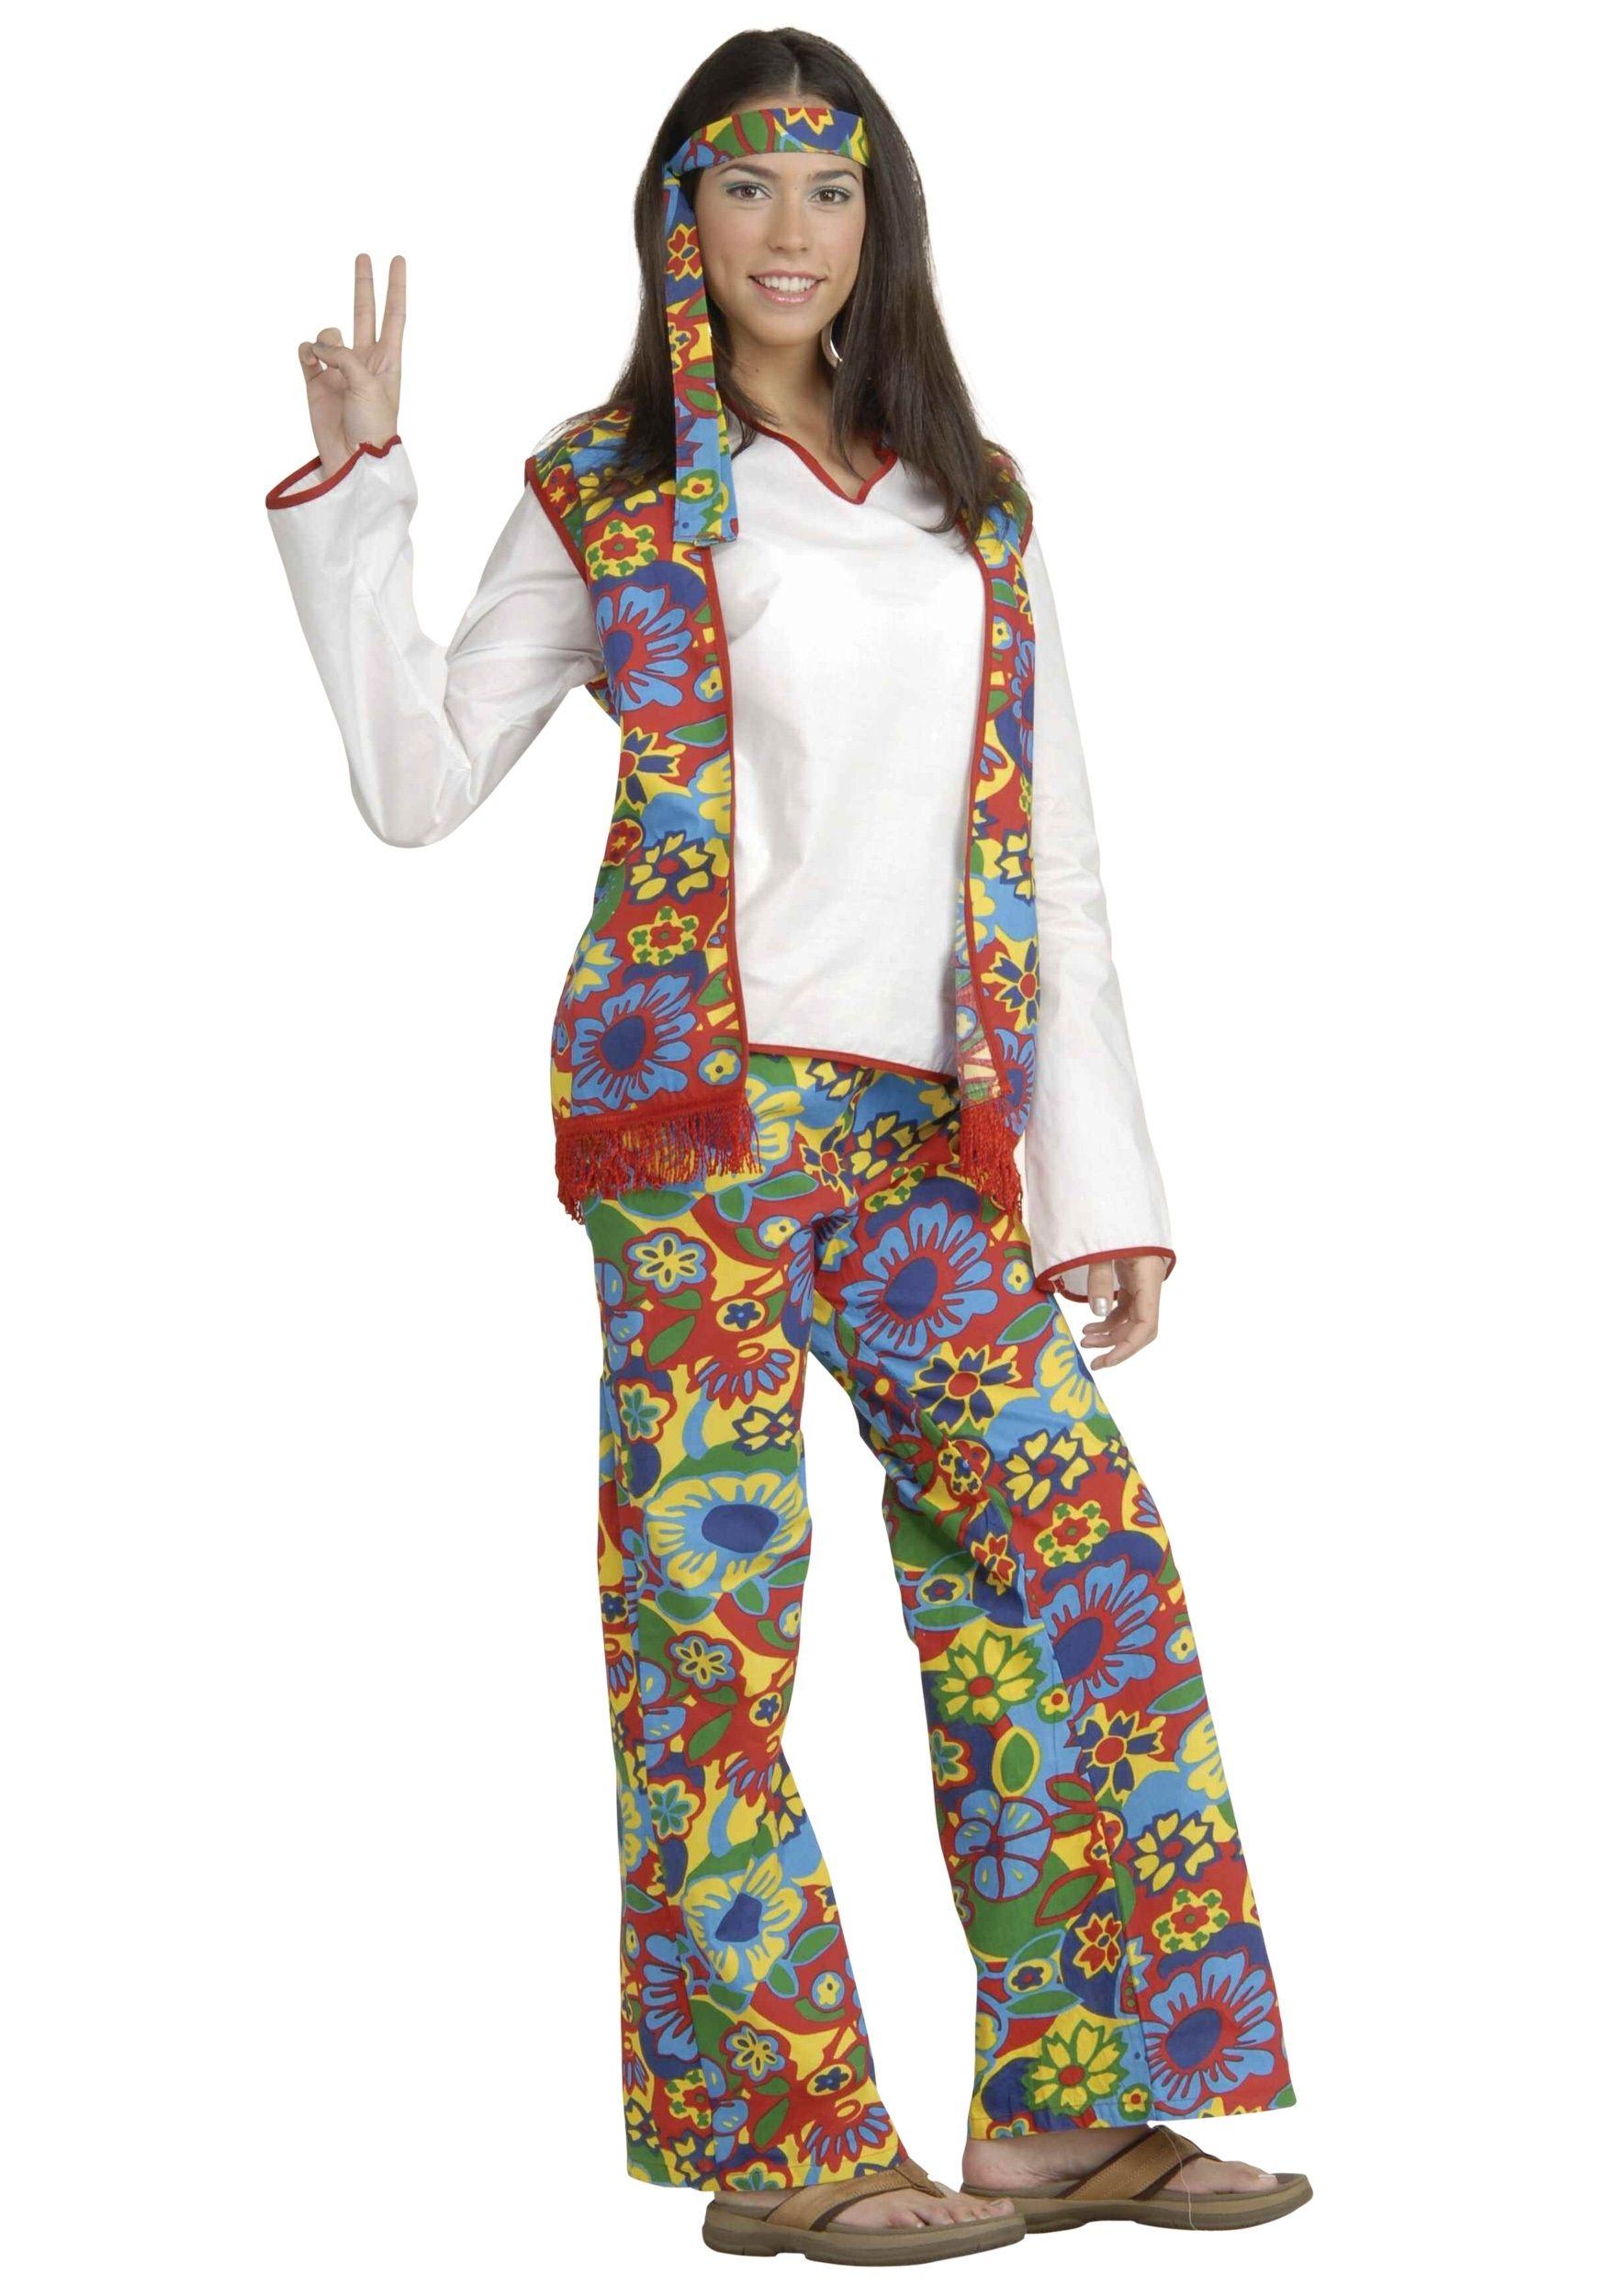 Костюм яркой девушки-хиппи (46-48) костюм цветочной хиппи 48